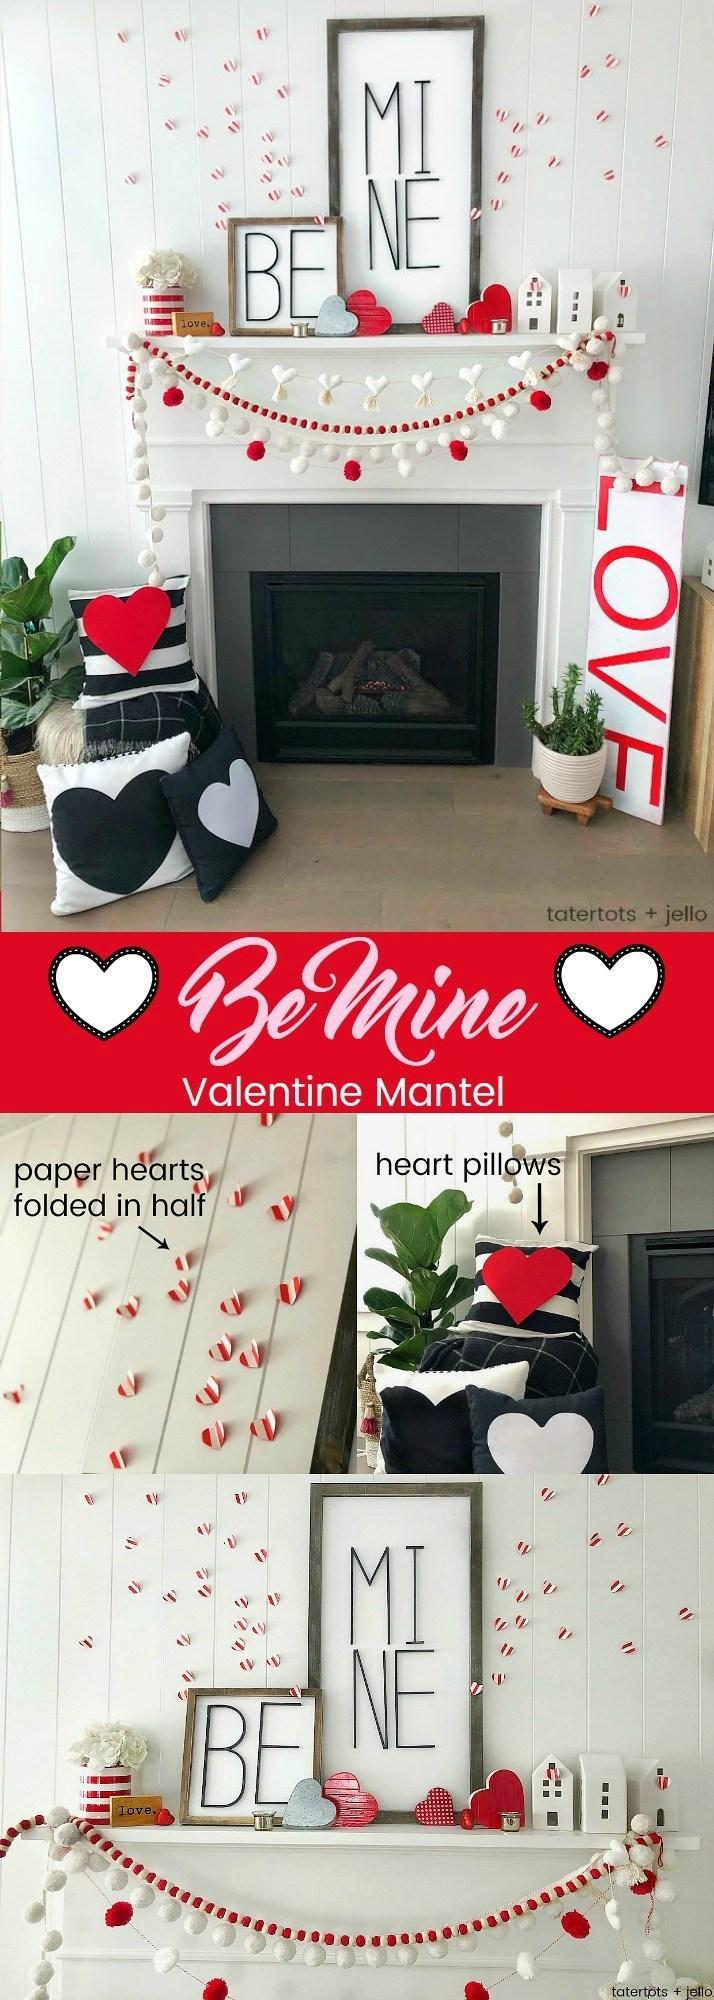 Valentine's Day Be Mine Mantel